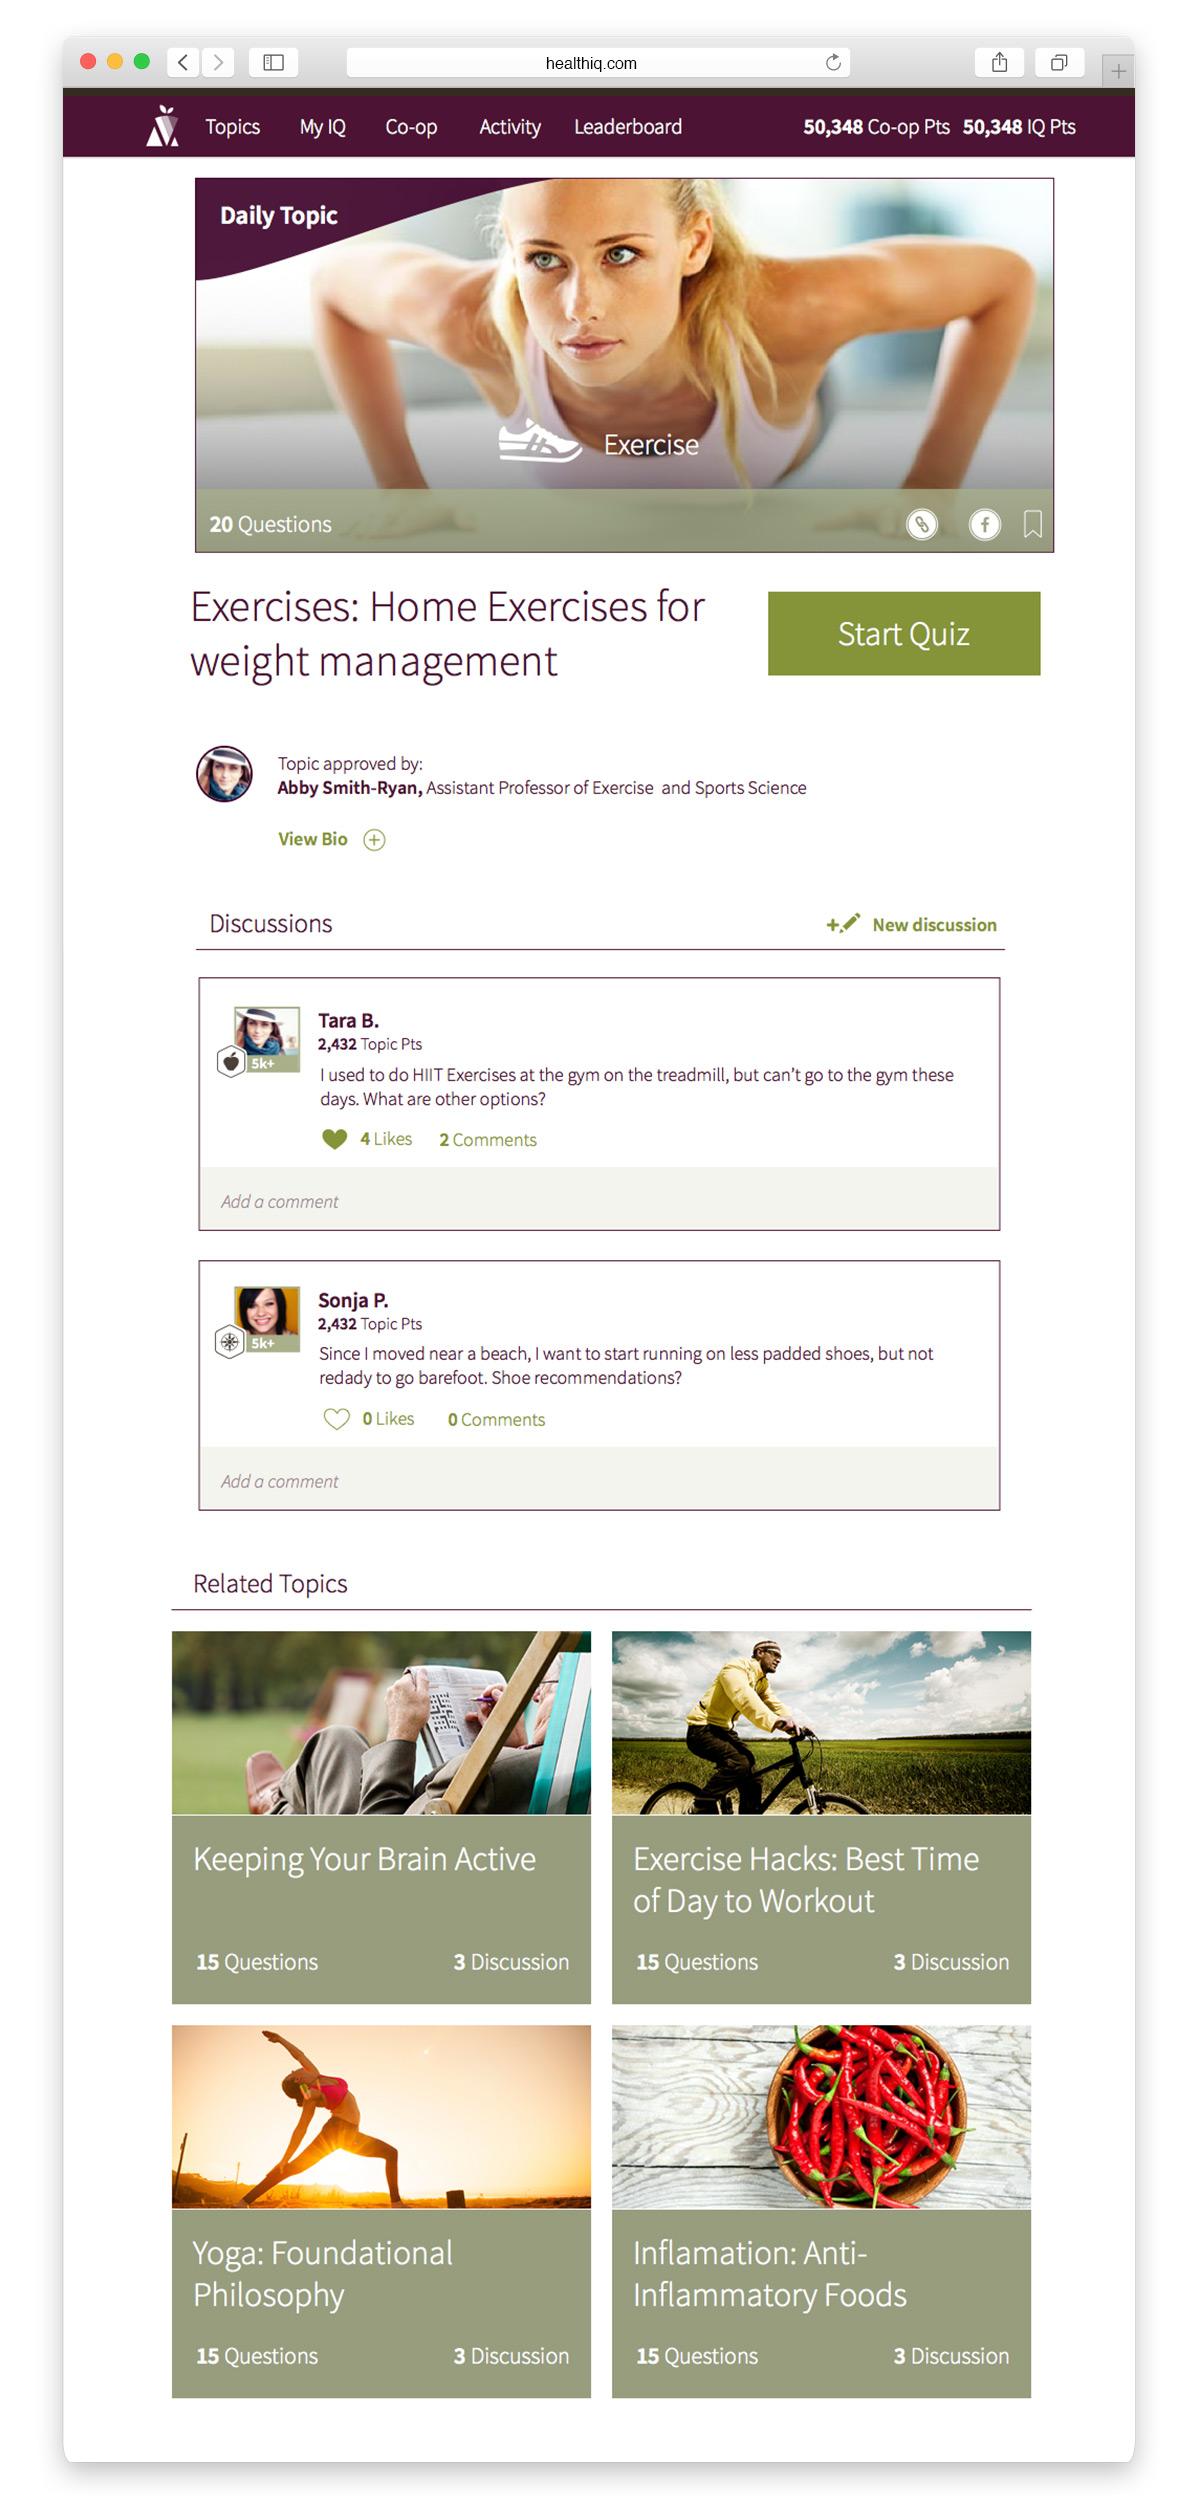 hiq-web-app-04.jpg